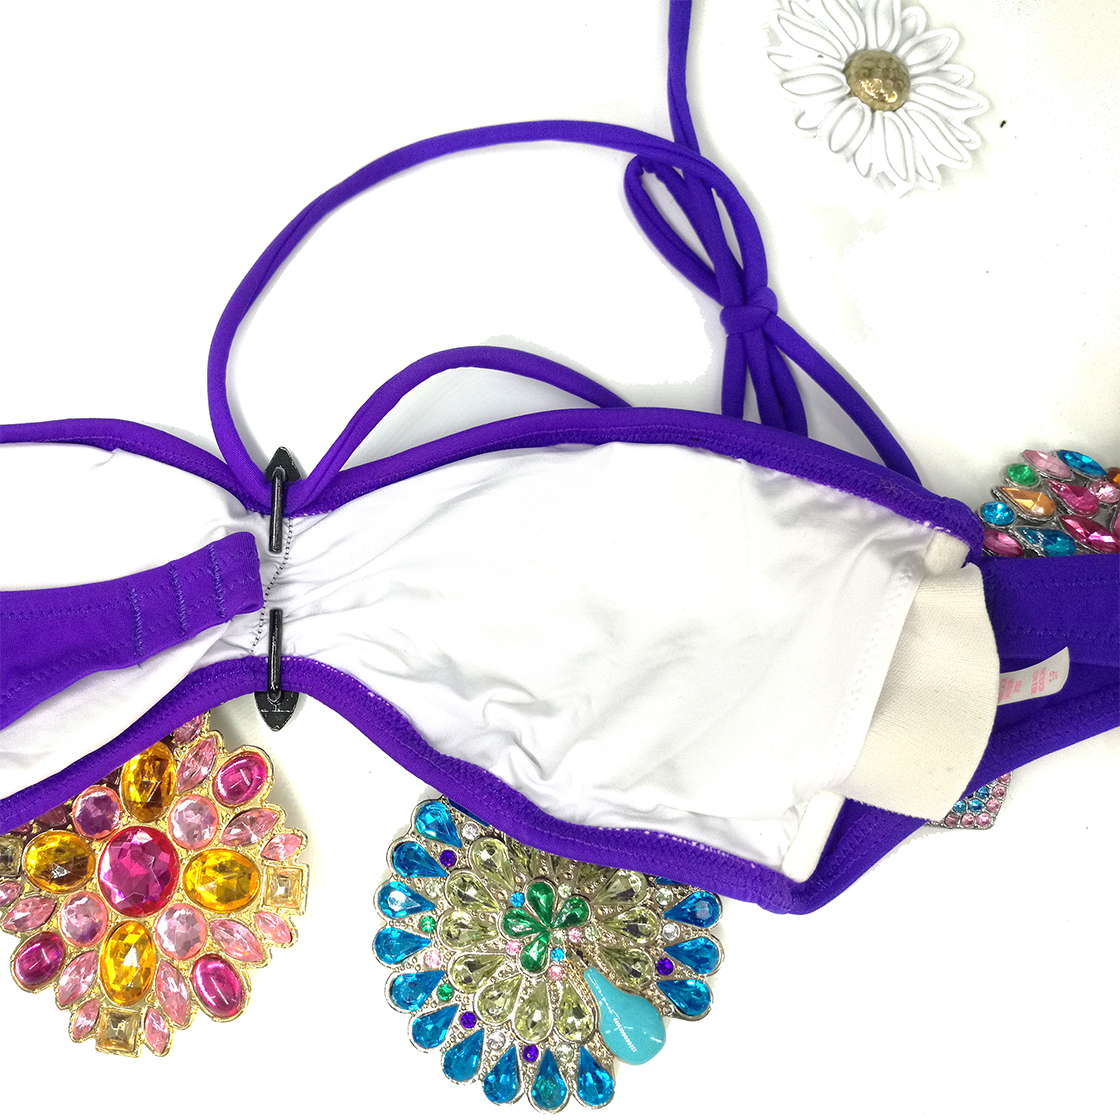 Mixer Bikini TOPS for Women Swimwear Top Original Design For Secret Diamond Purple Bathing suits Sexy swimming biquini UP 2